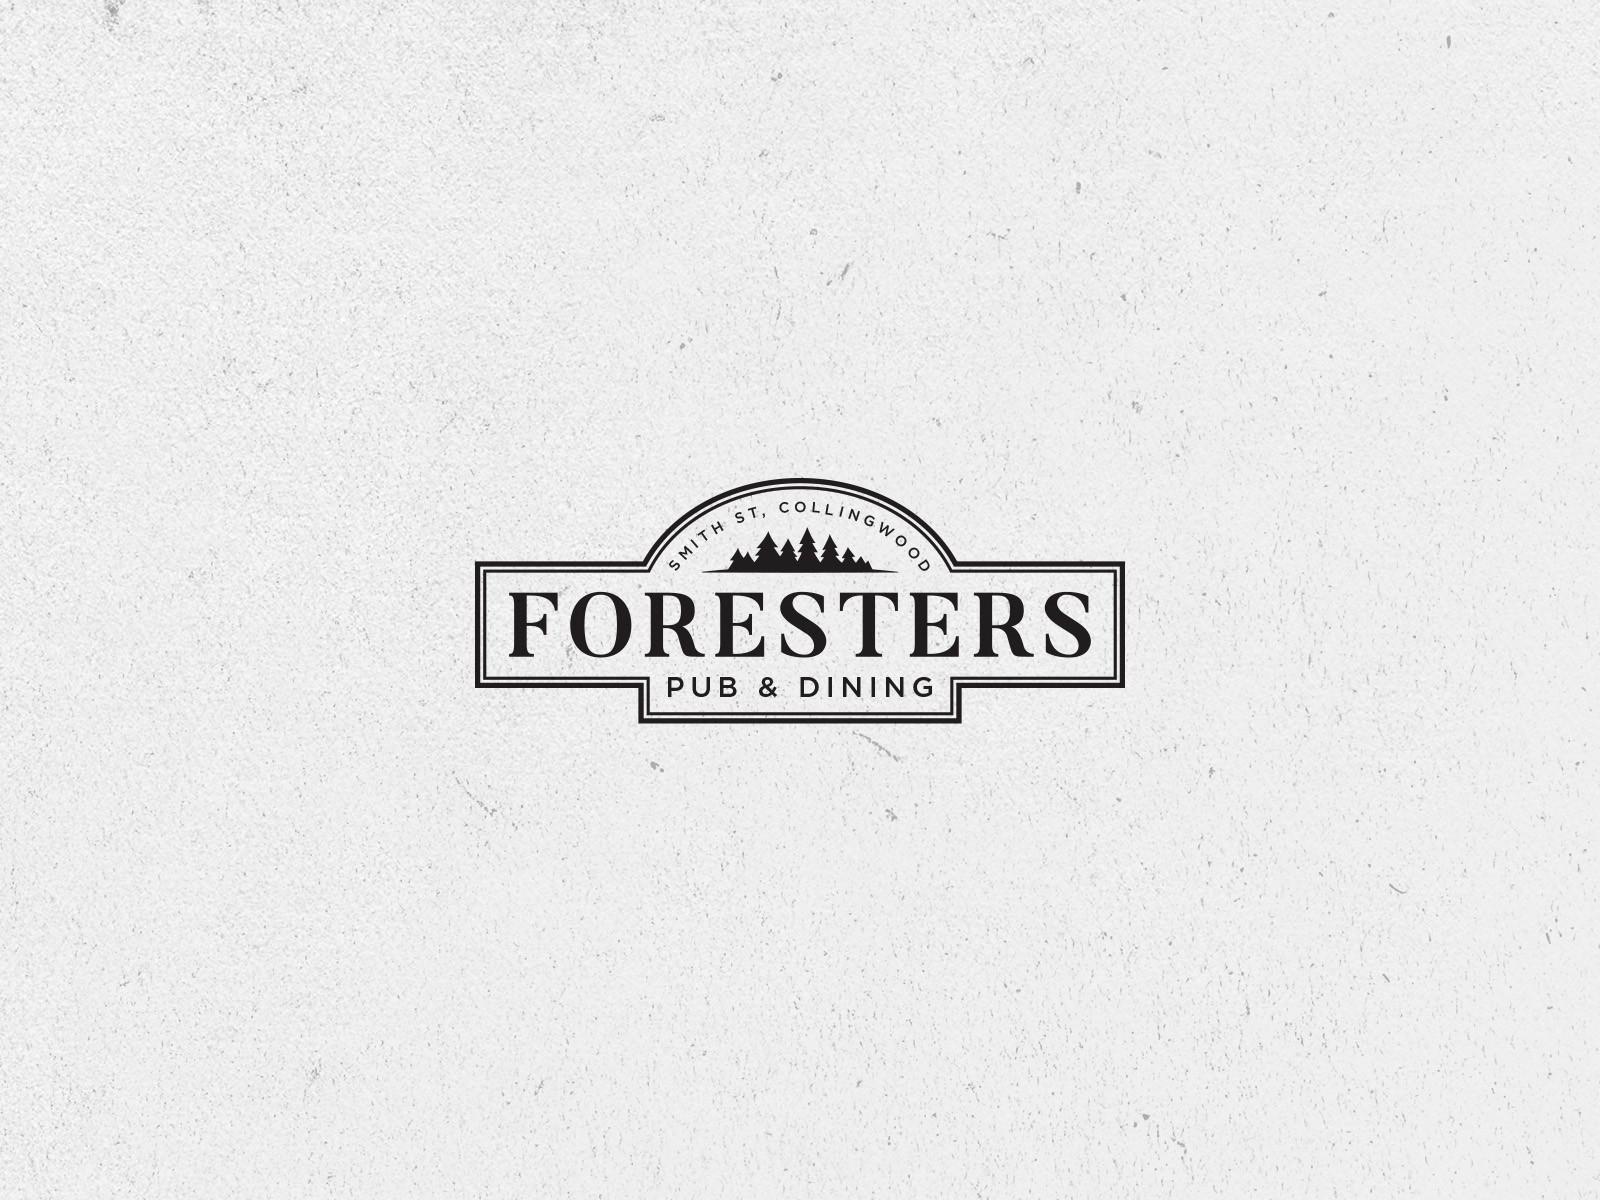 Eclectic Adventurer style venue needs a grand logo